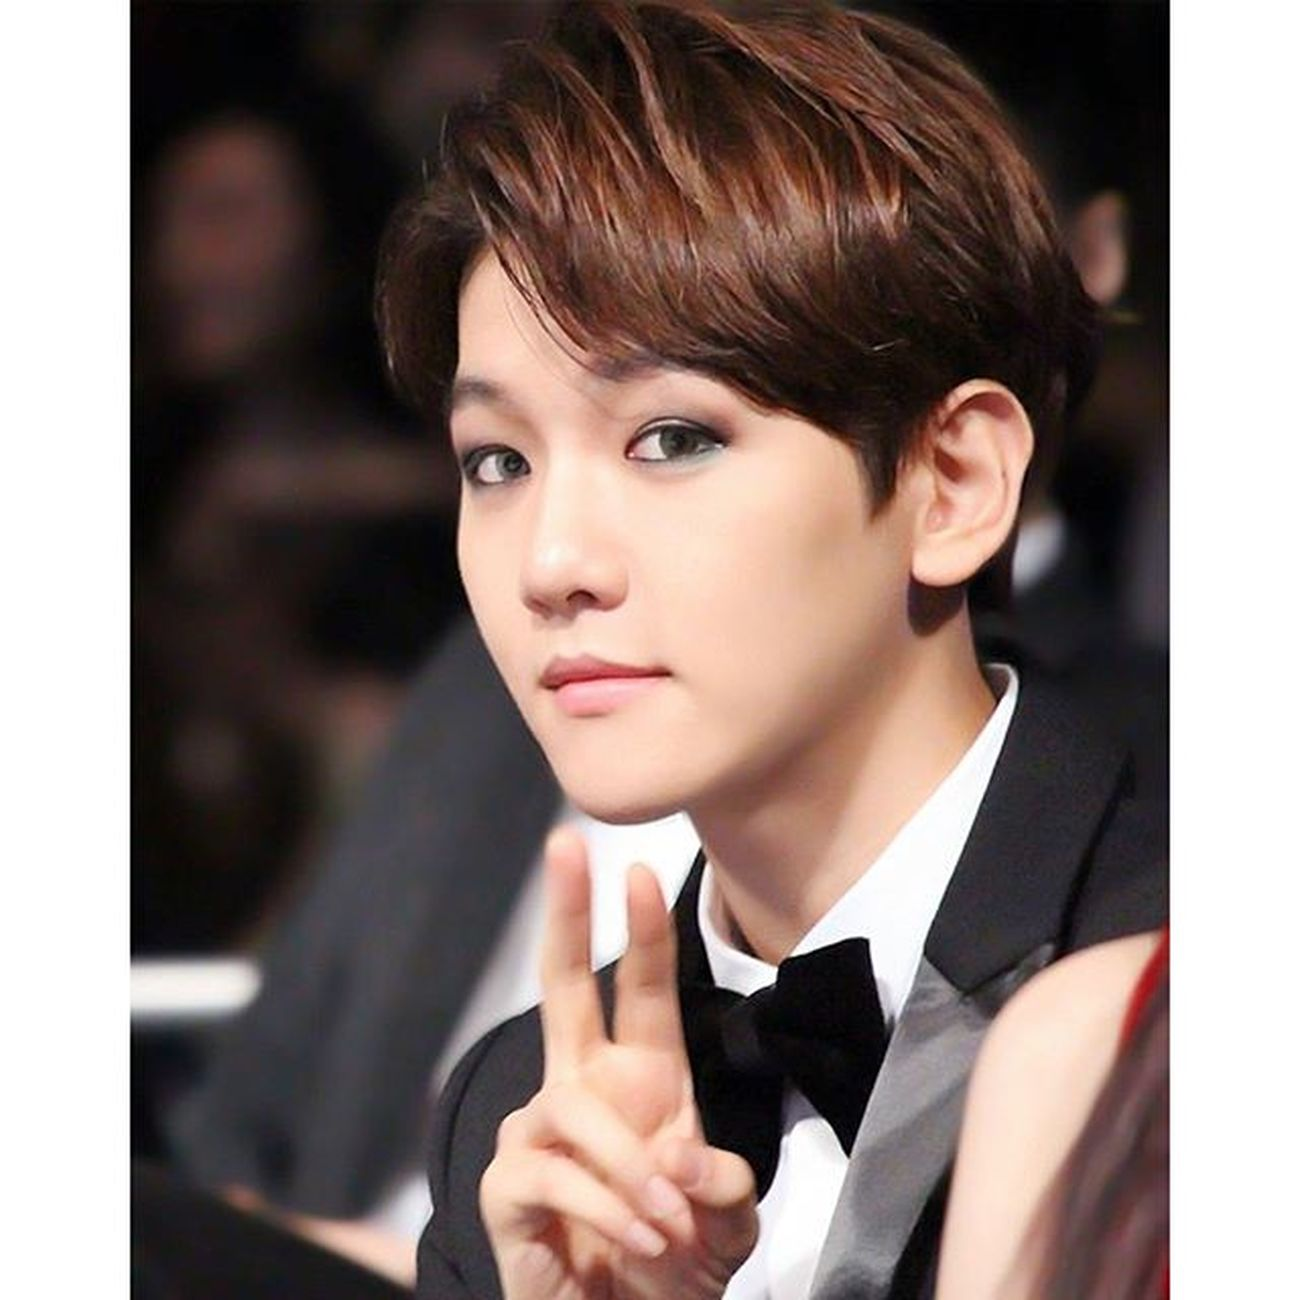 EXO Byun Baek Hyun byunbaekhyun mreyeliner @baekhyunee_exo